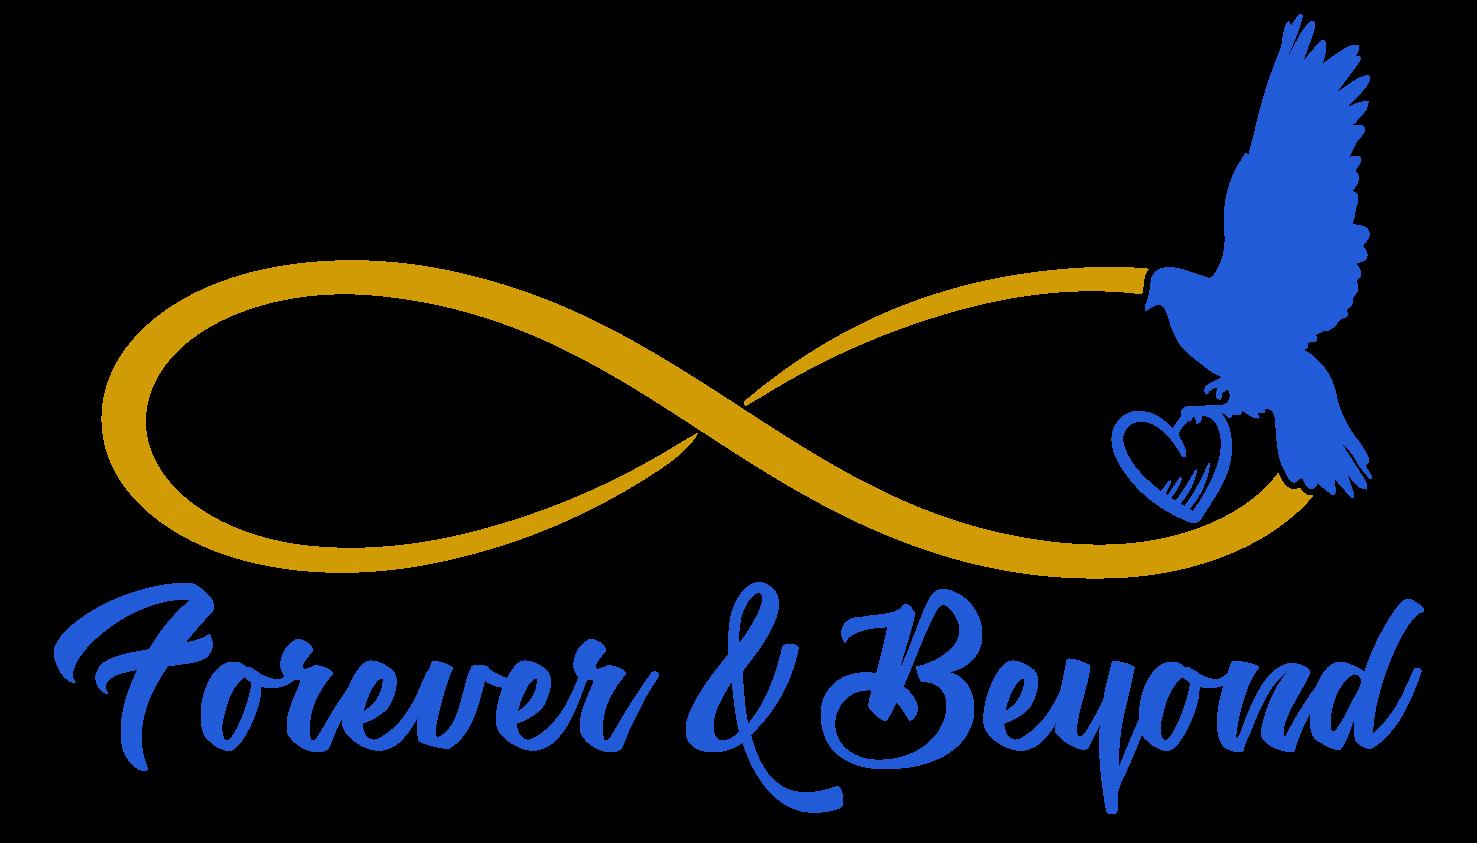 Forever & Beyond